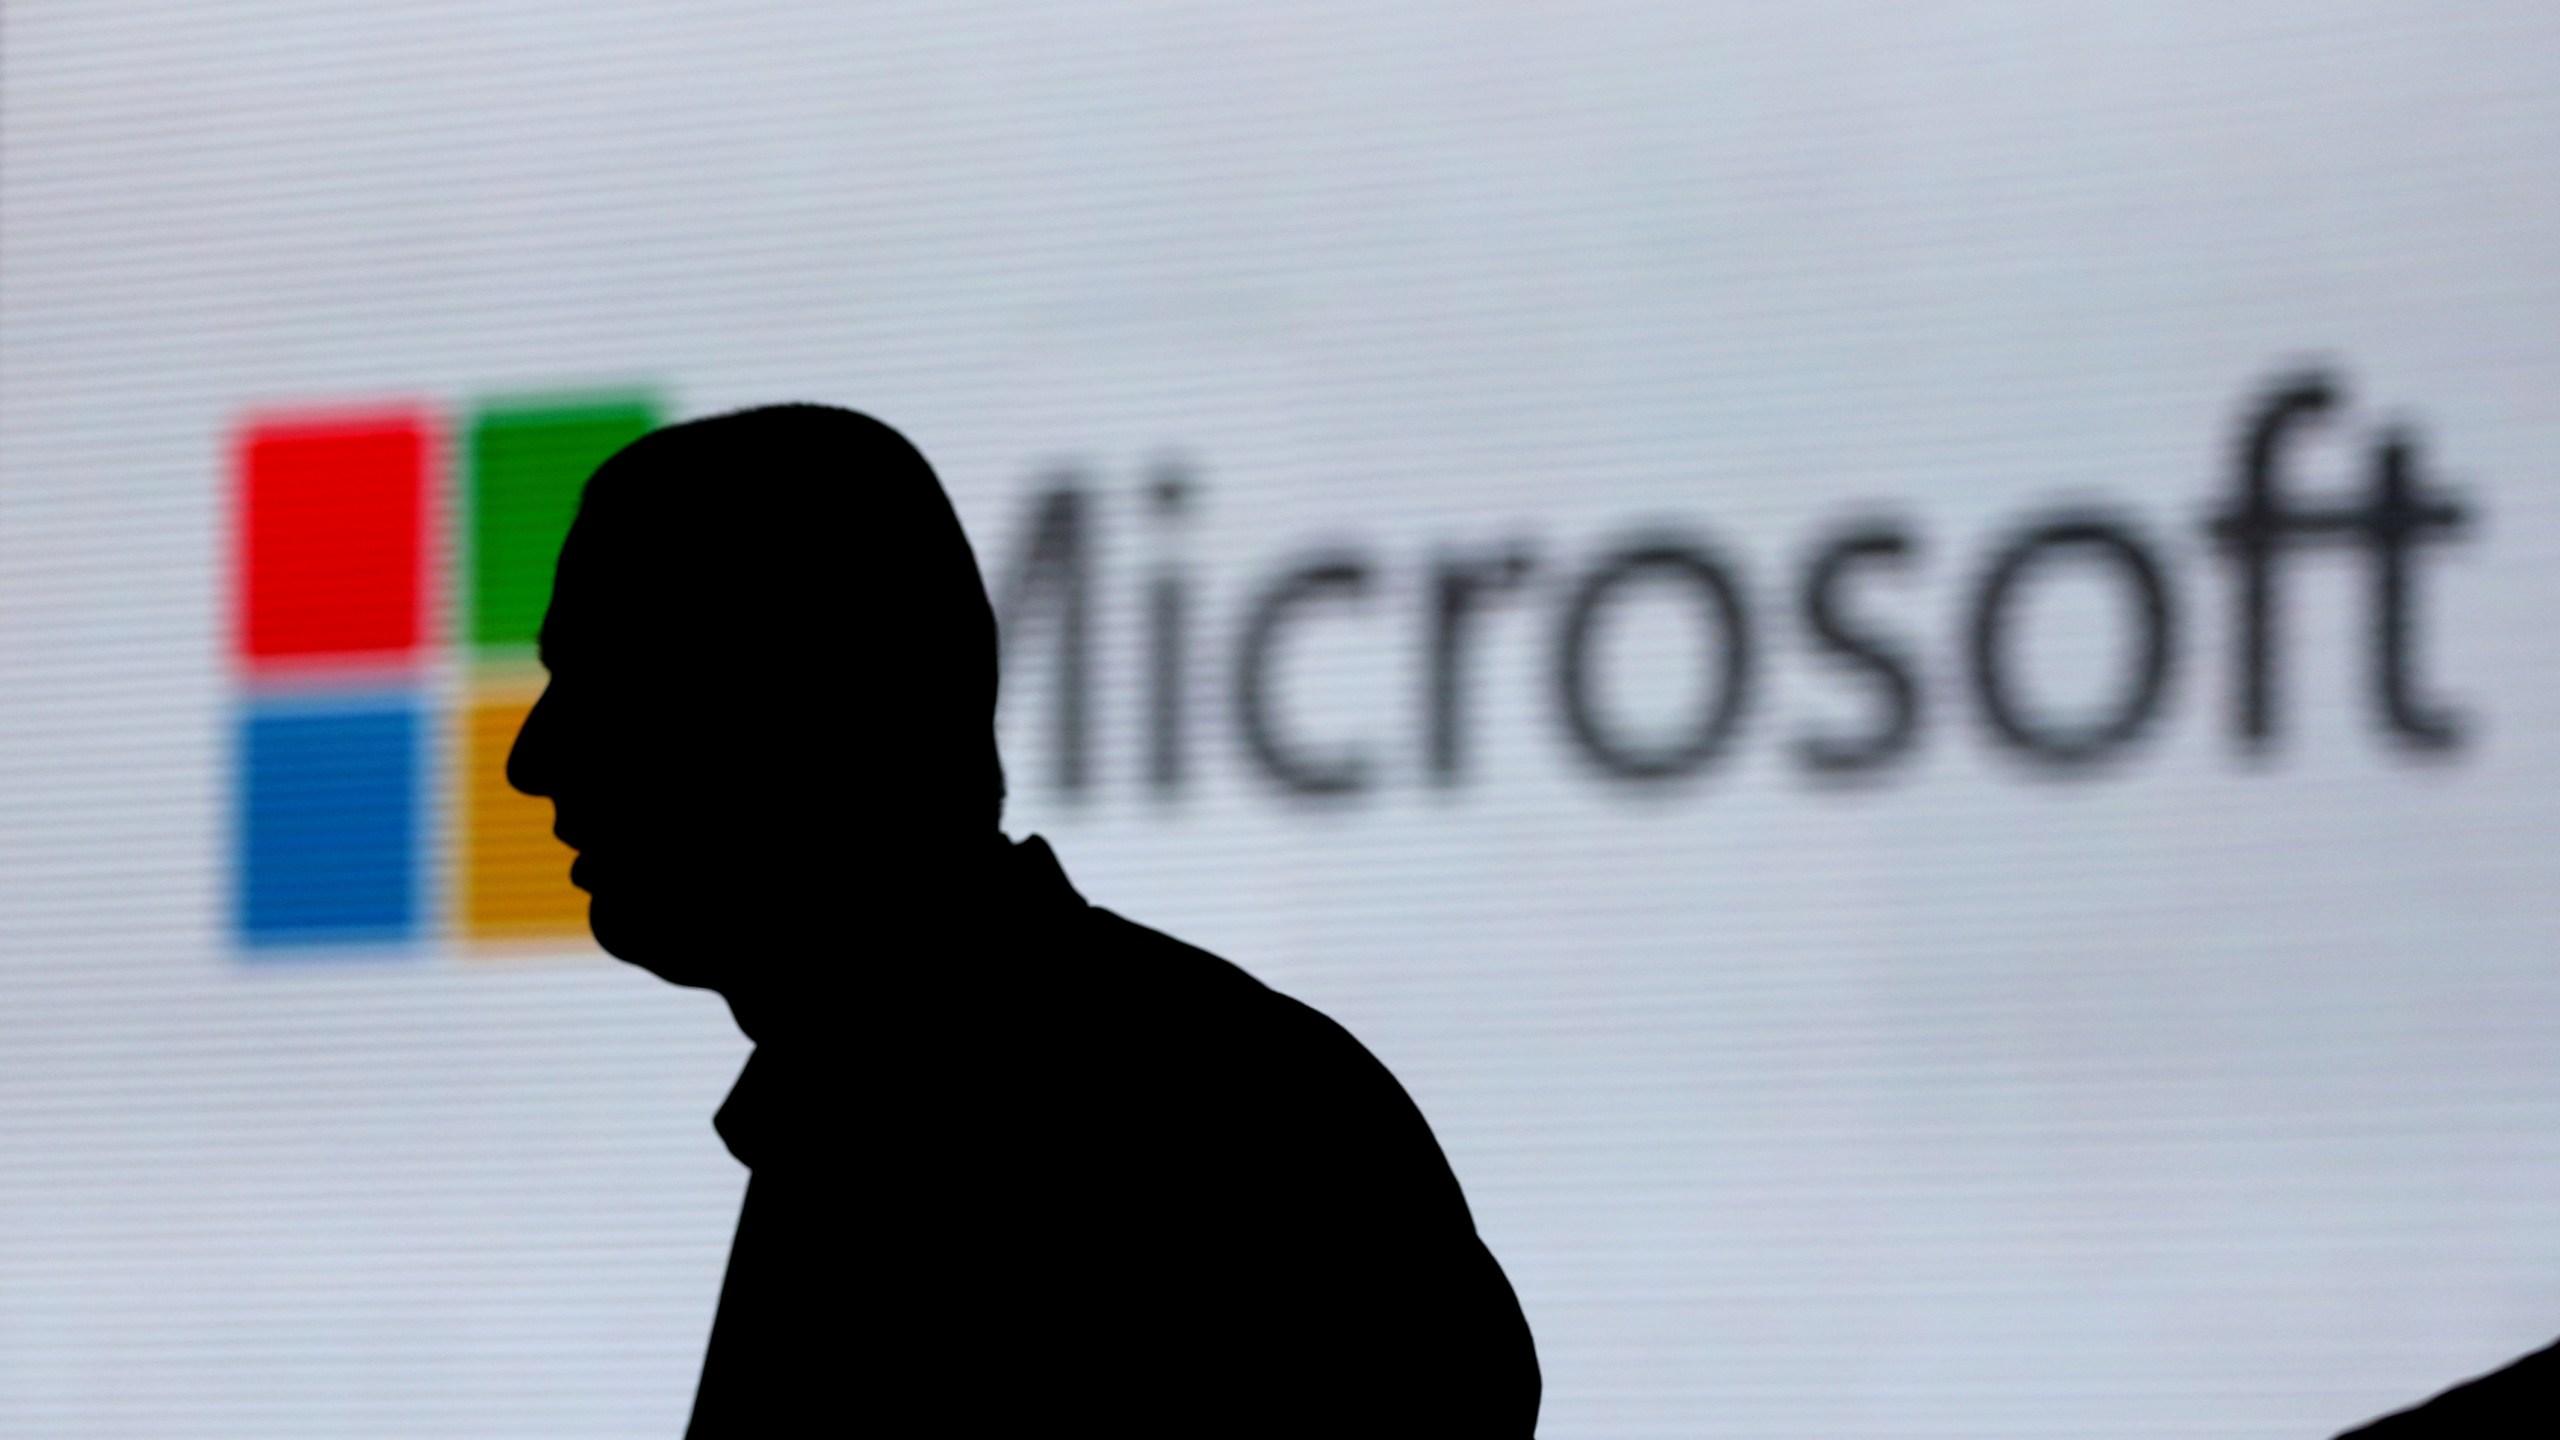 Europe_Data_Privacy_Microsoft_34279-159532.jpg44913166